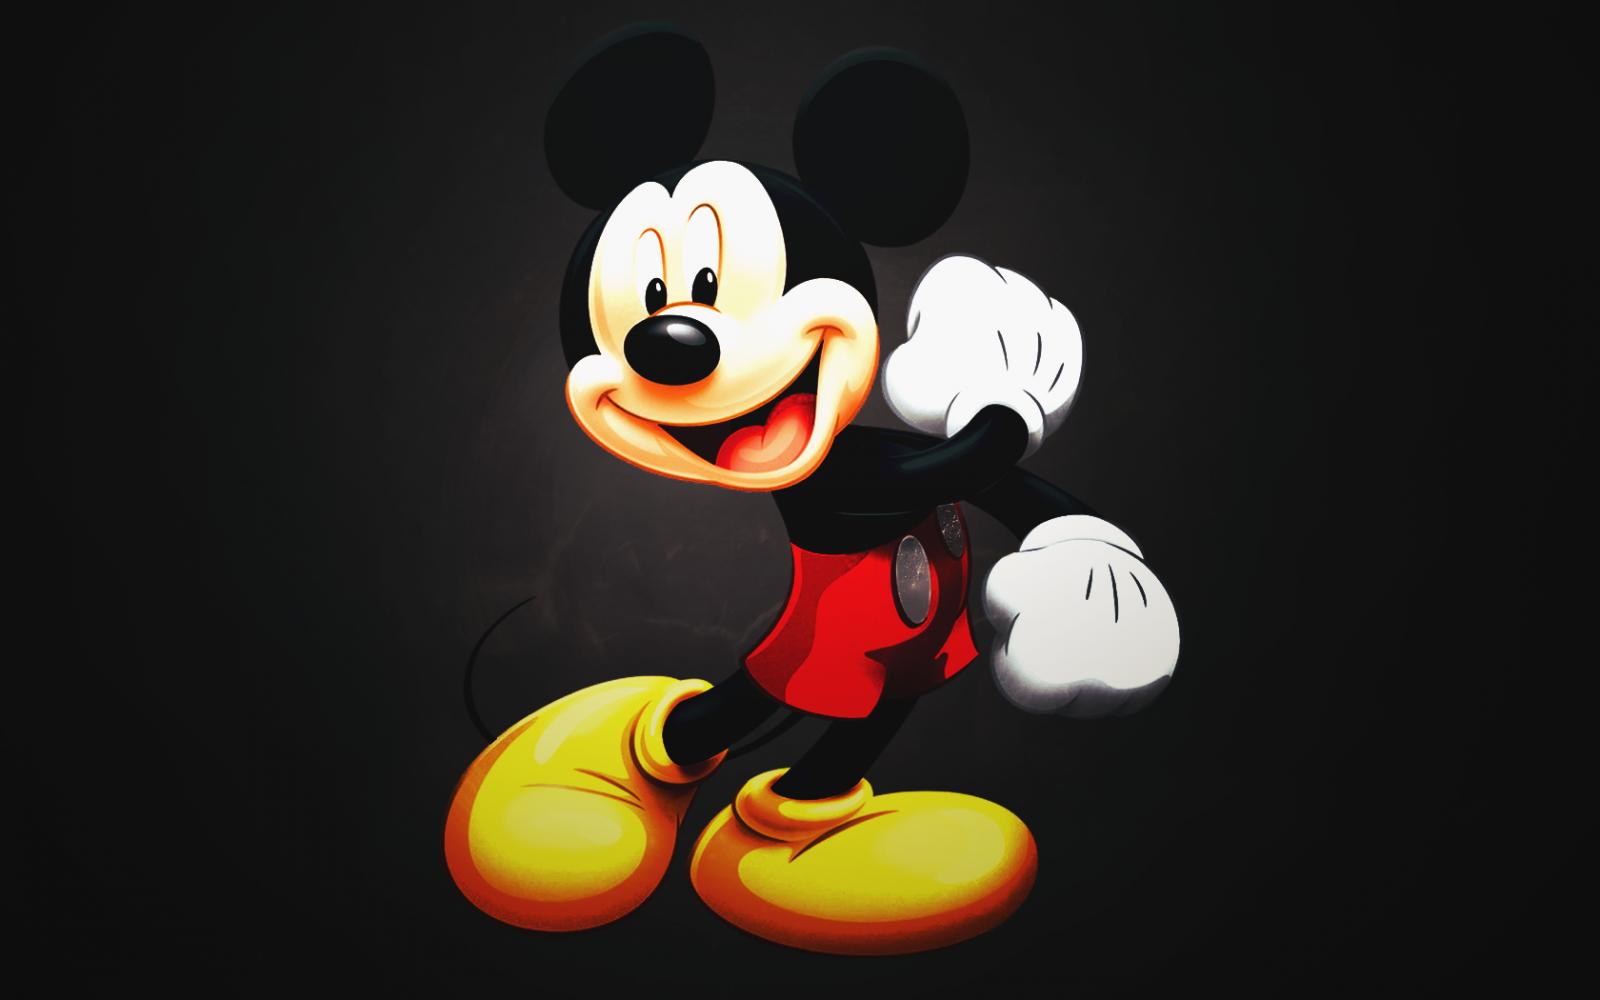 Papel De Parede Ilustracao Mickey Mouse Criancas Amarelo